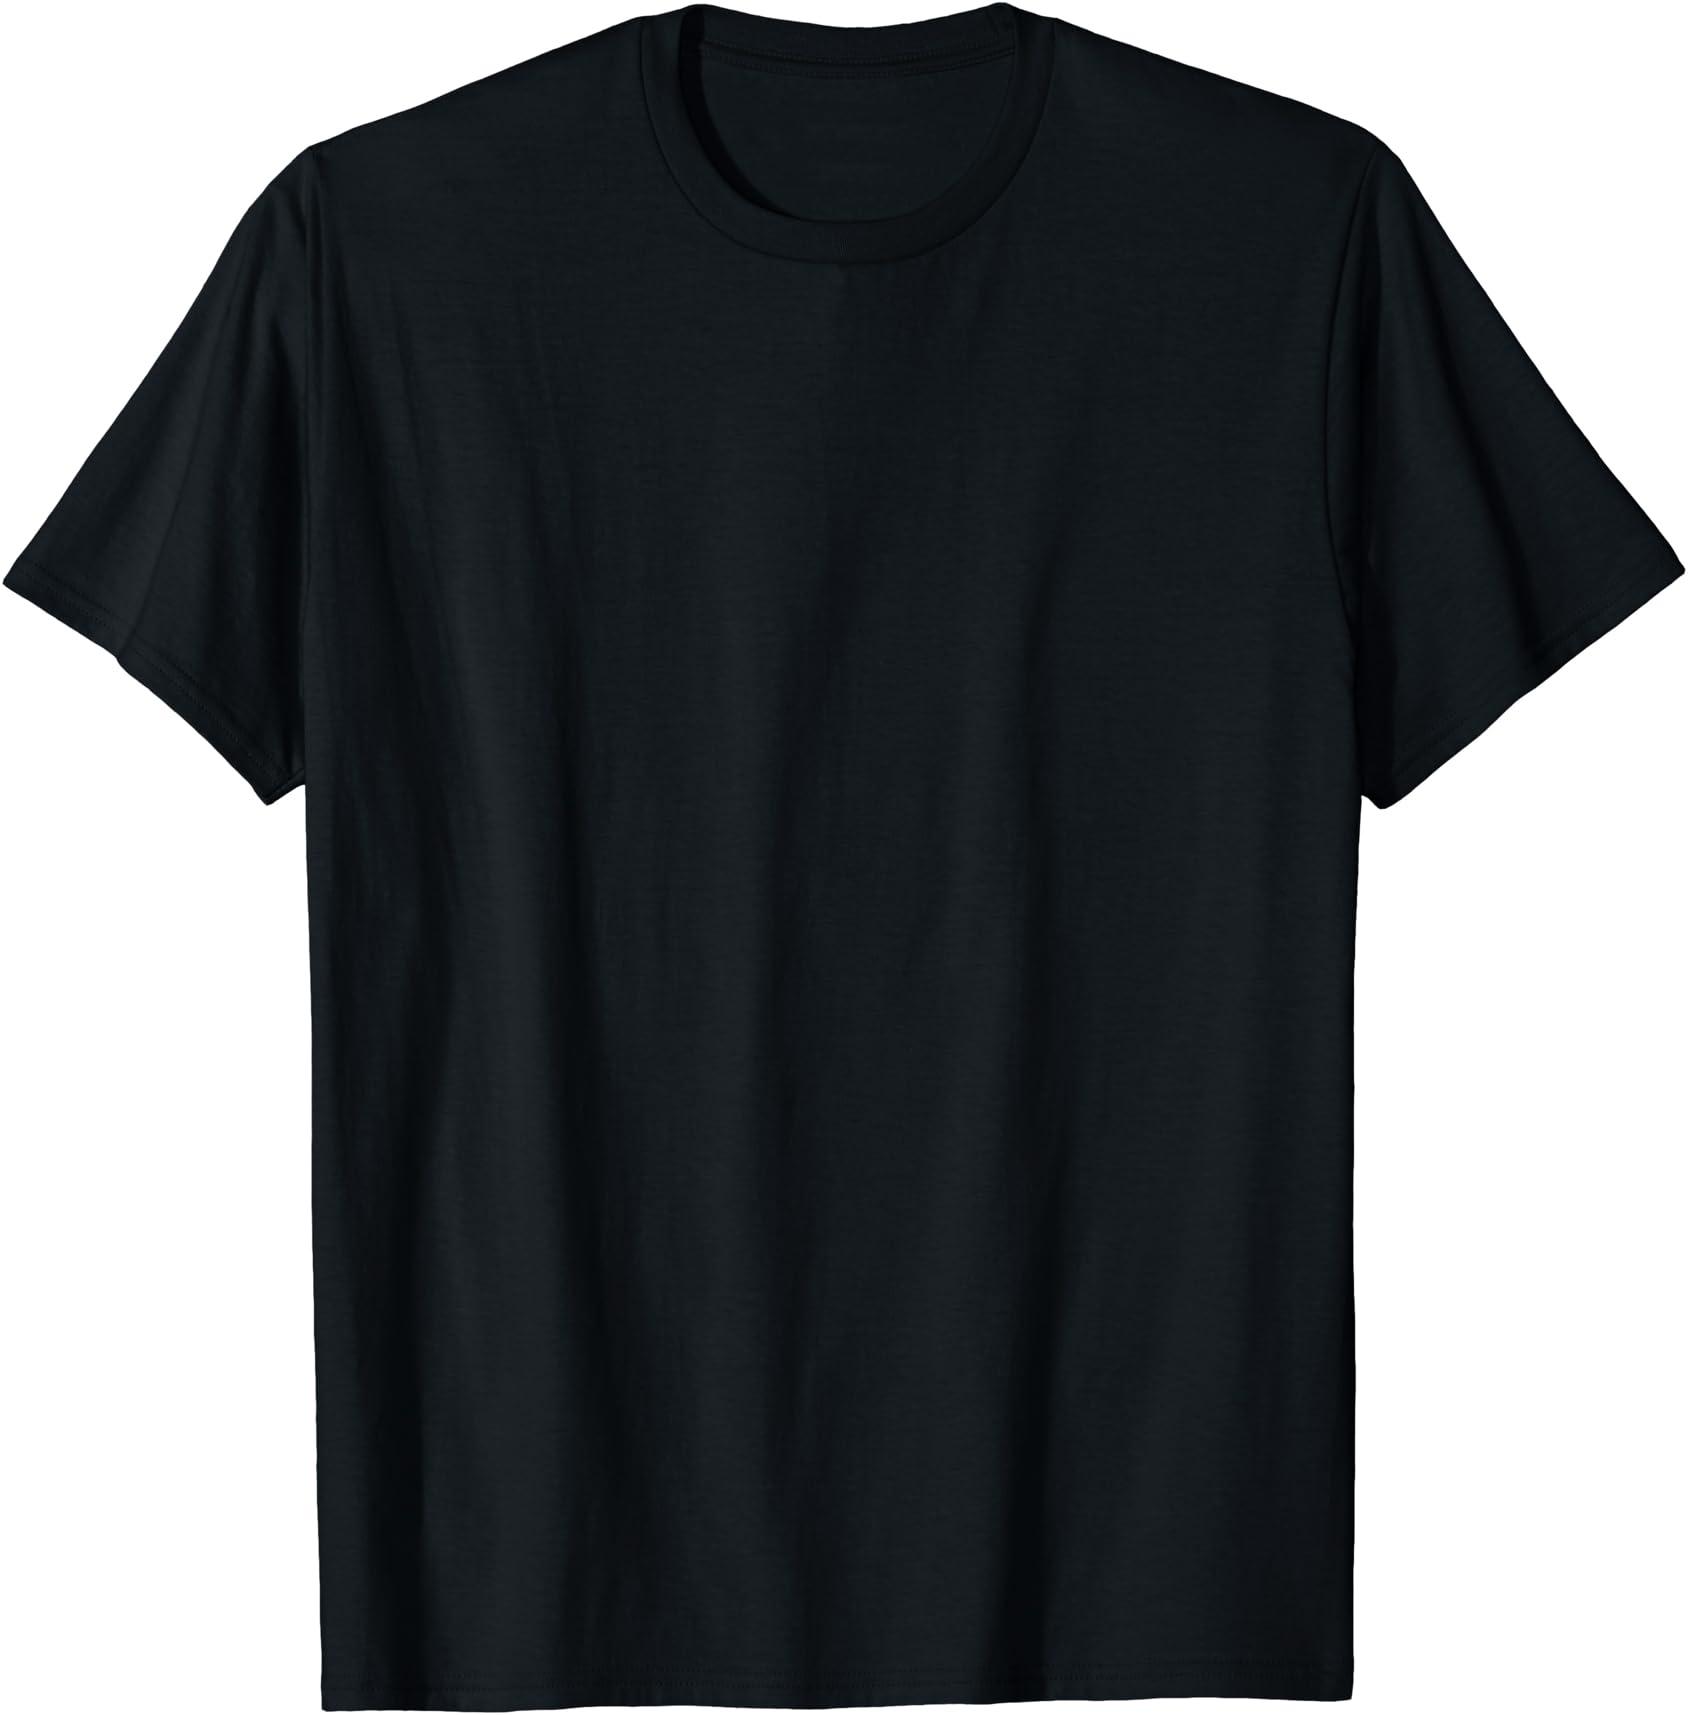 MEN/'S WHITE SHORT SLEEVE DRESS CLUB CLUBBING TEE TSHIRT WITH SIGNATURE PRINT